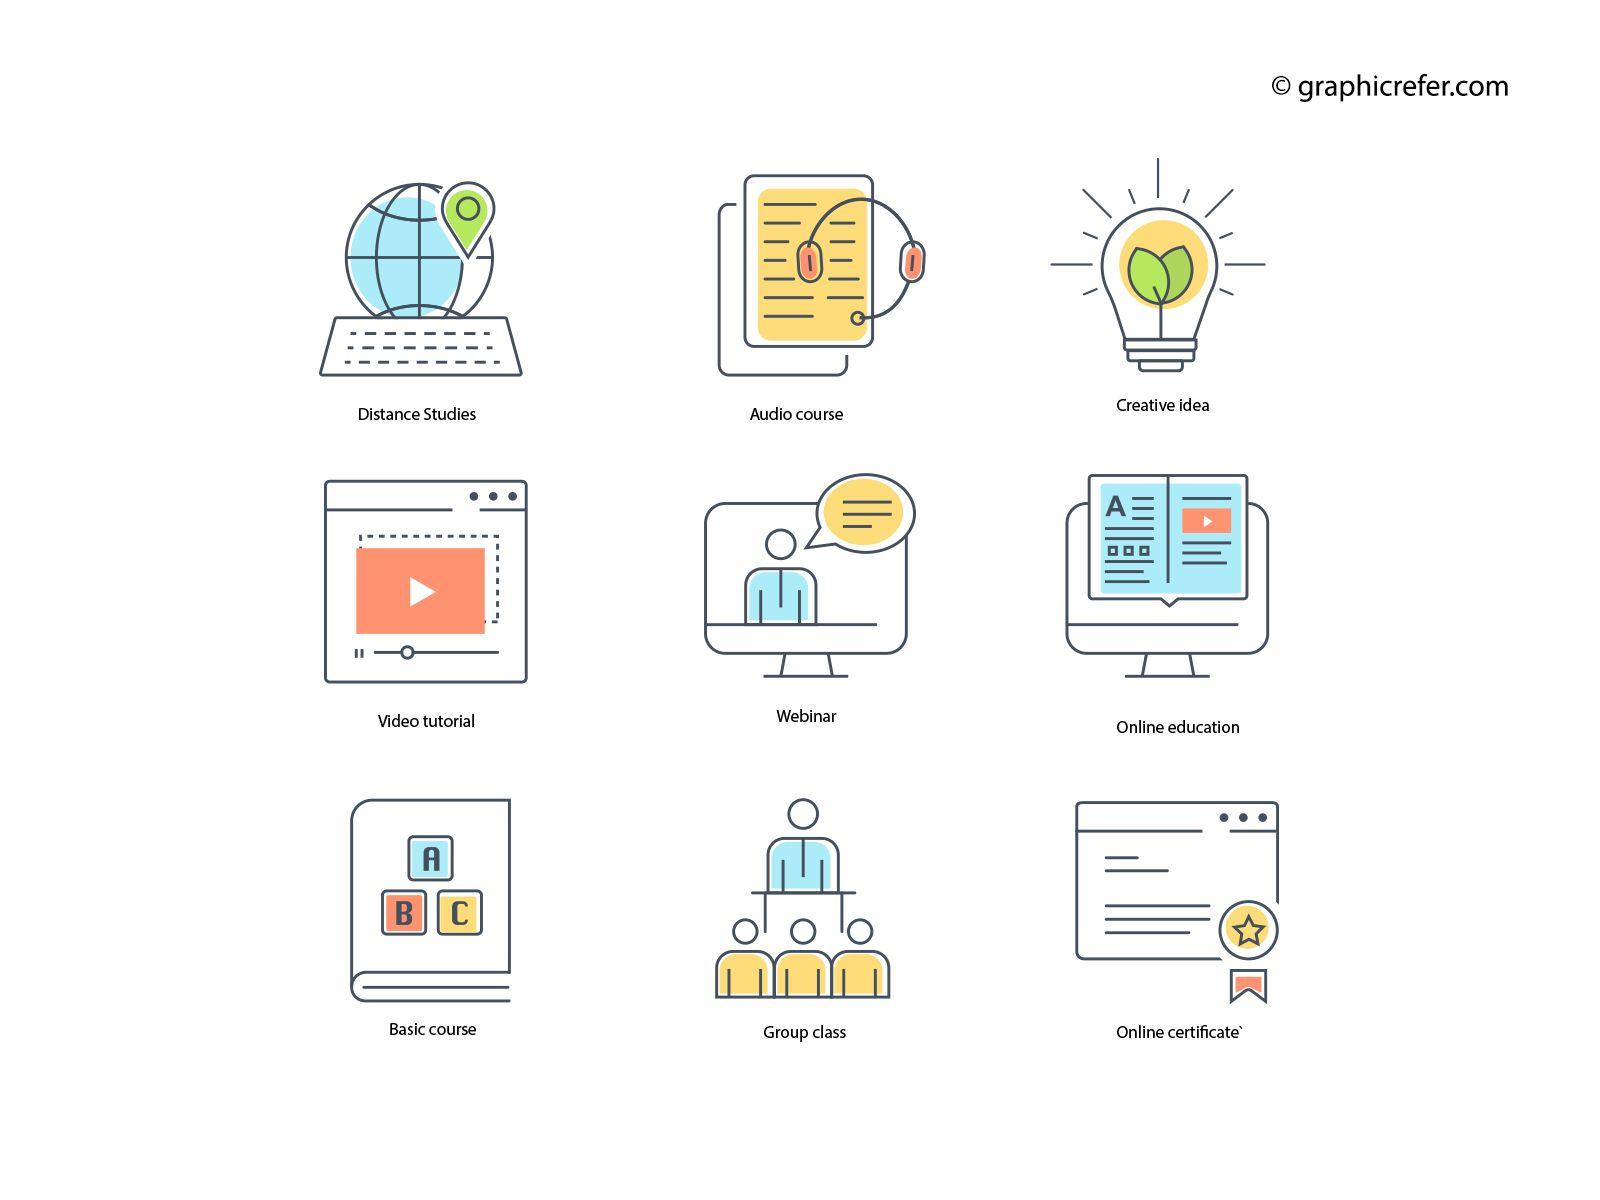 Free Online Course Icons Education Icon Set Education Icon